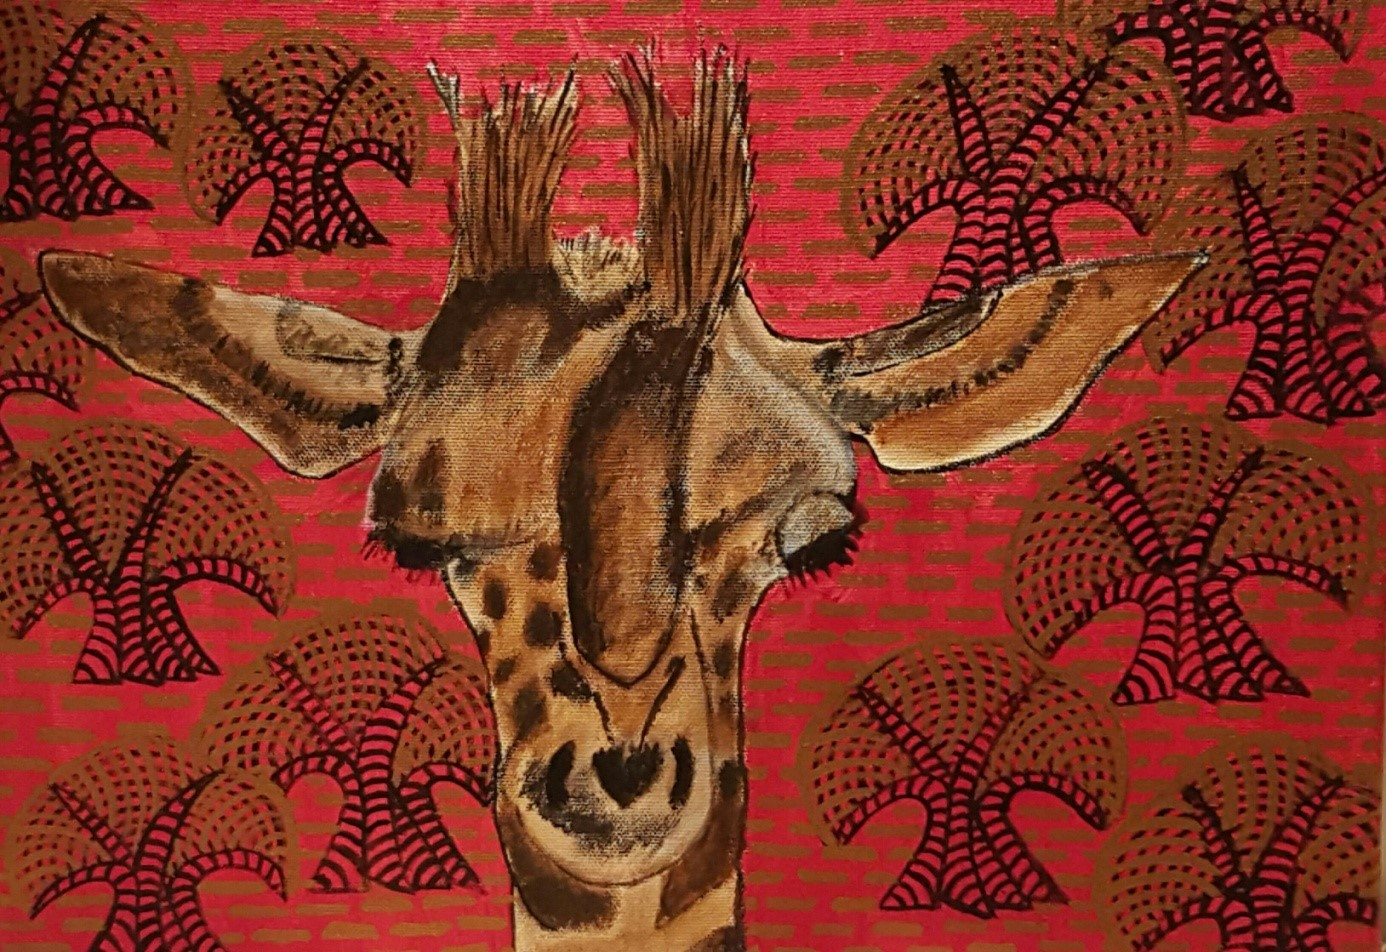 Giraffenportrait mit Bäumen